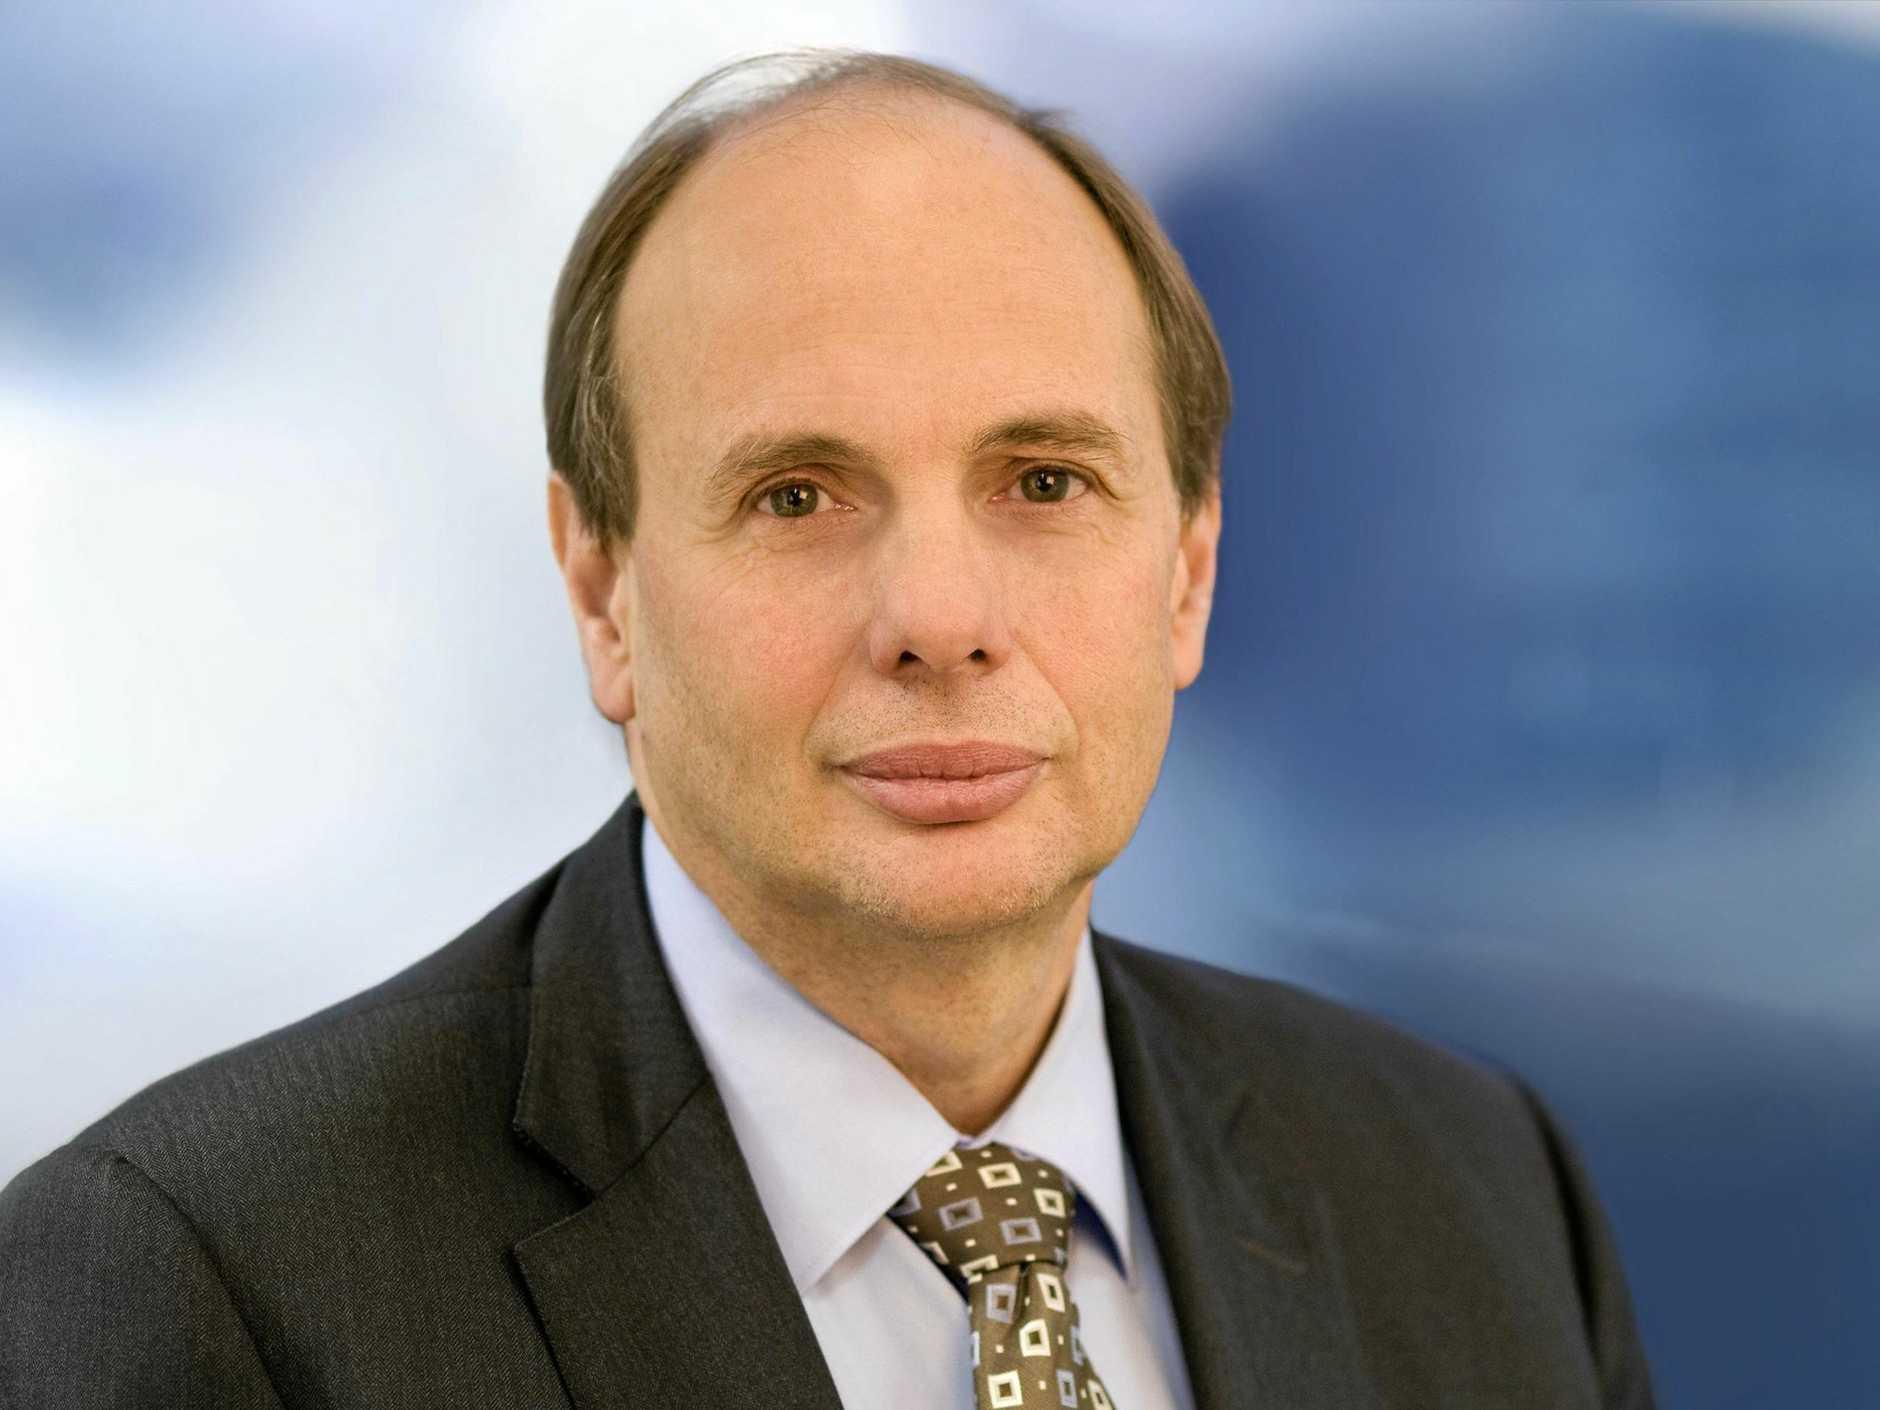 Business Council Australia president Grant King.